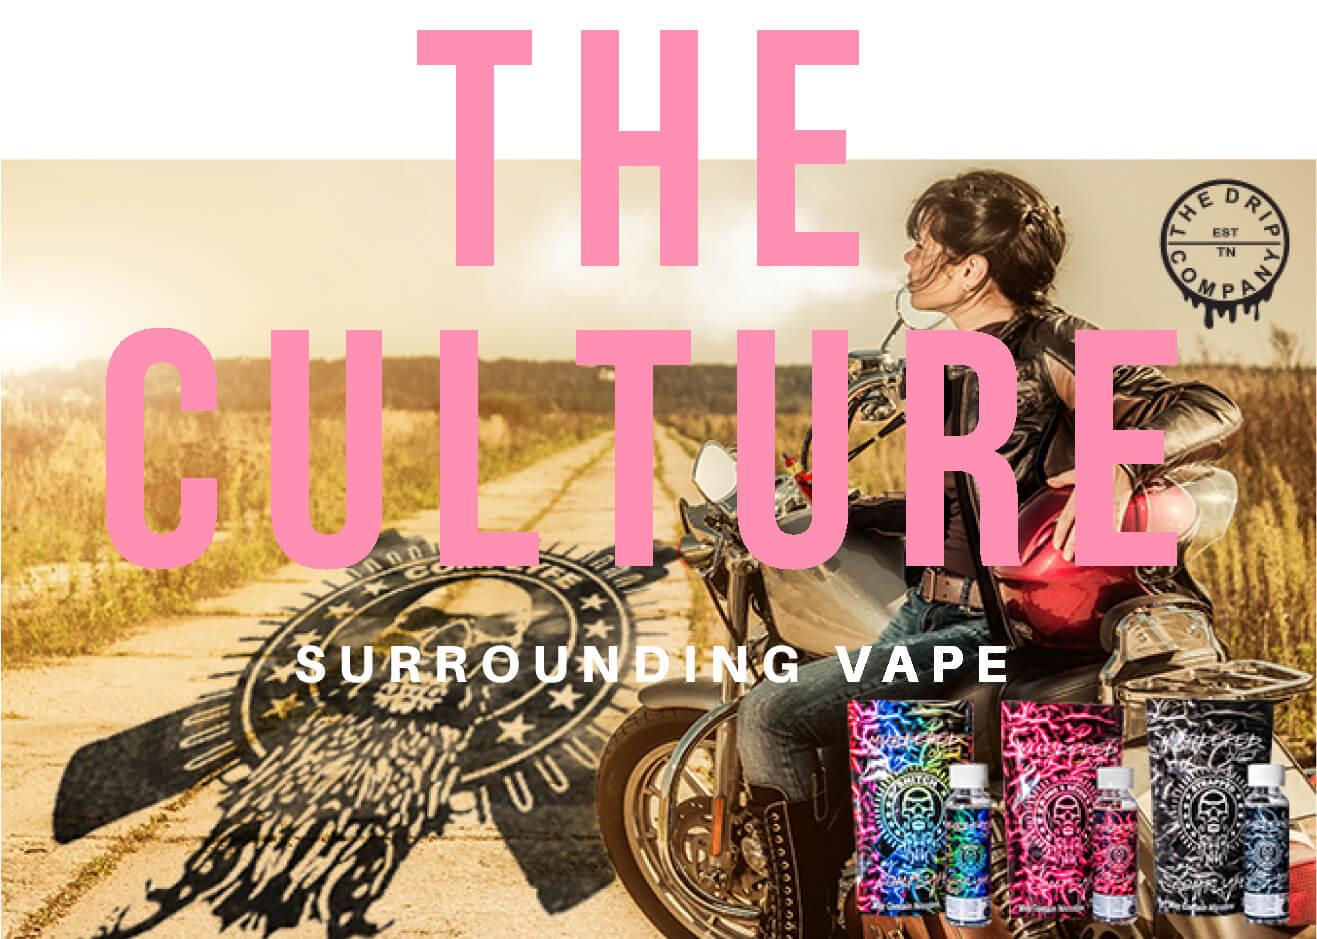 ejuice-magazine-culture-article-blog01